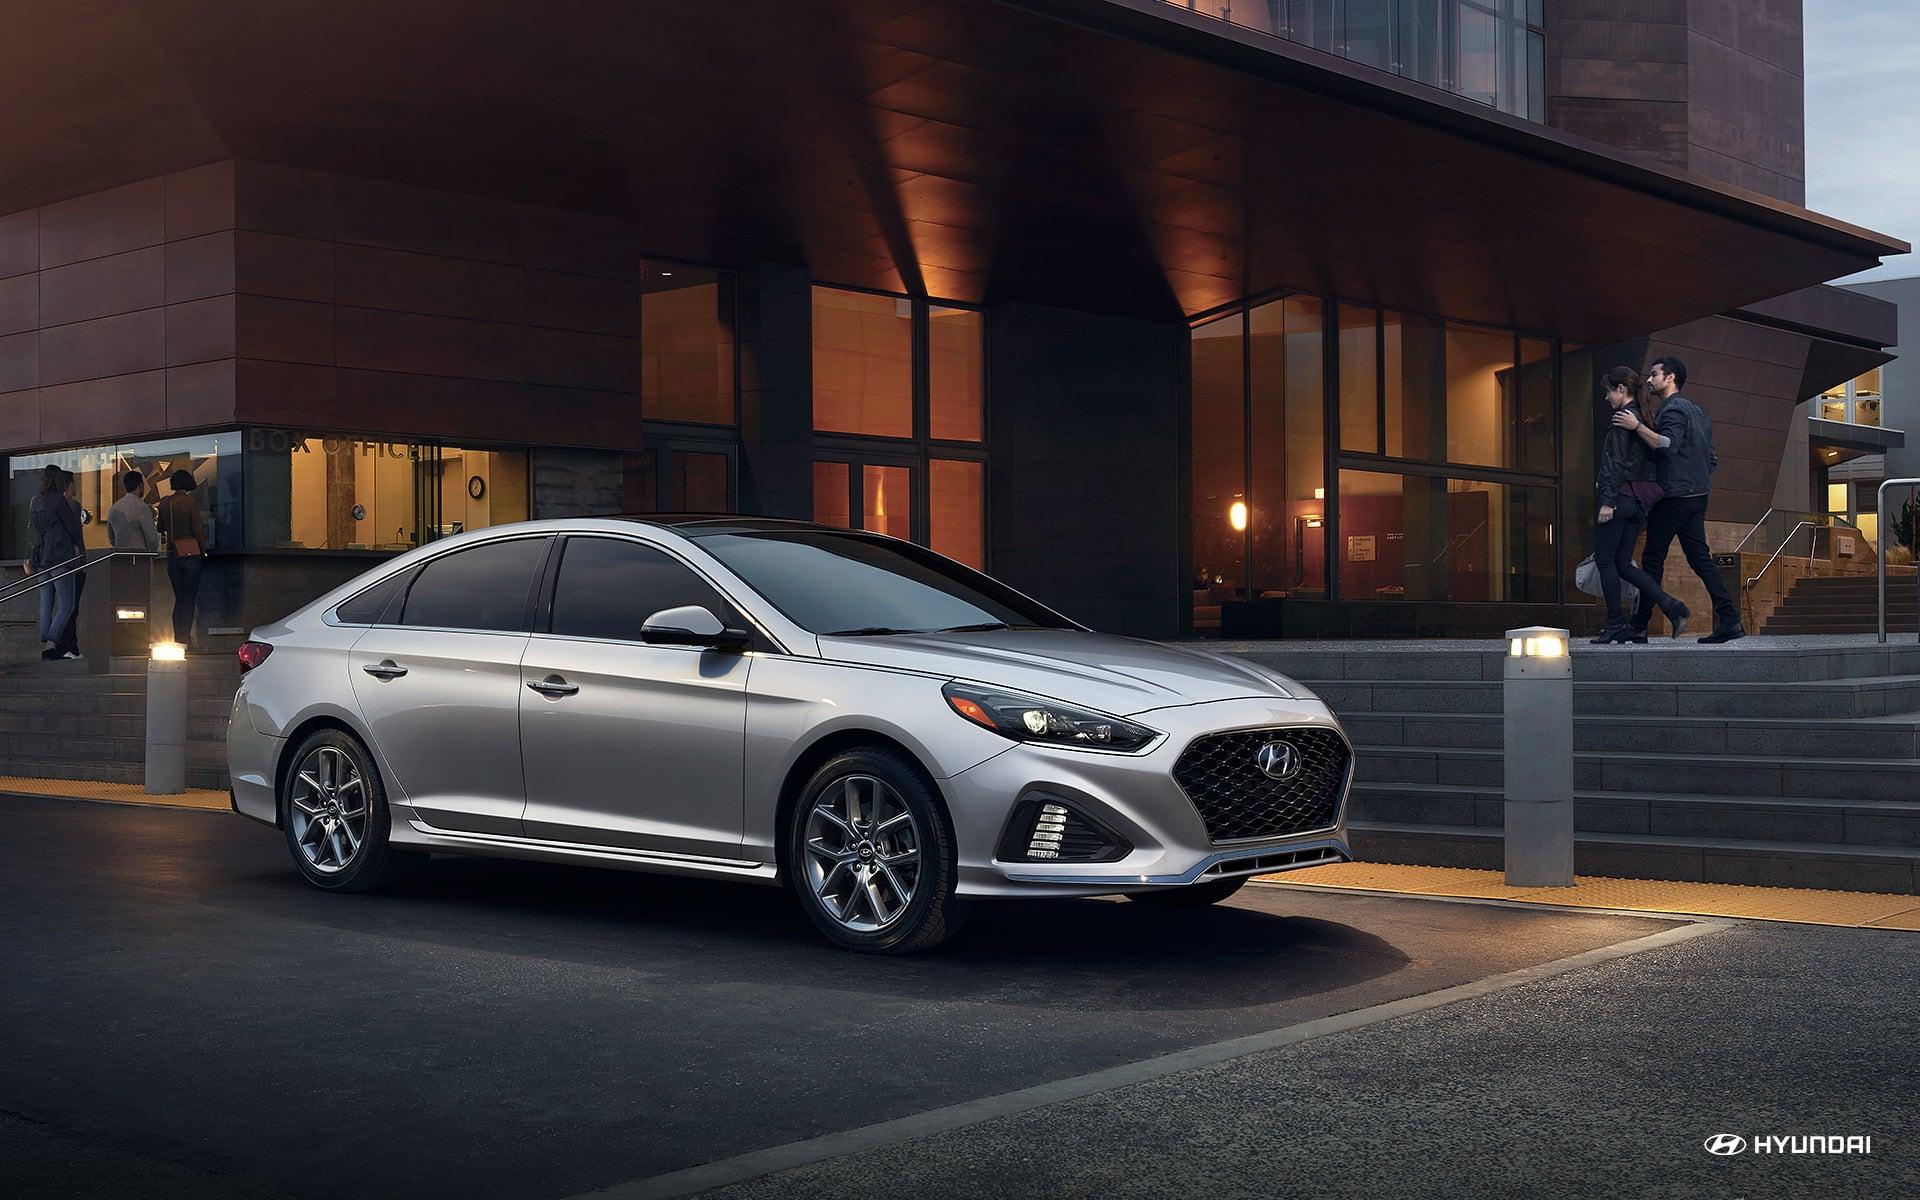 2019 Hyundai Sonata Leasing near Stafford, VA